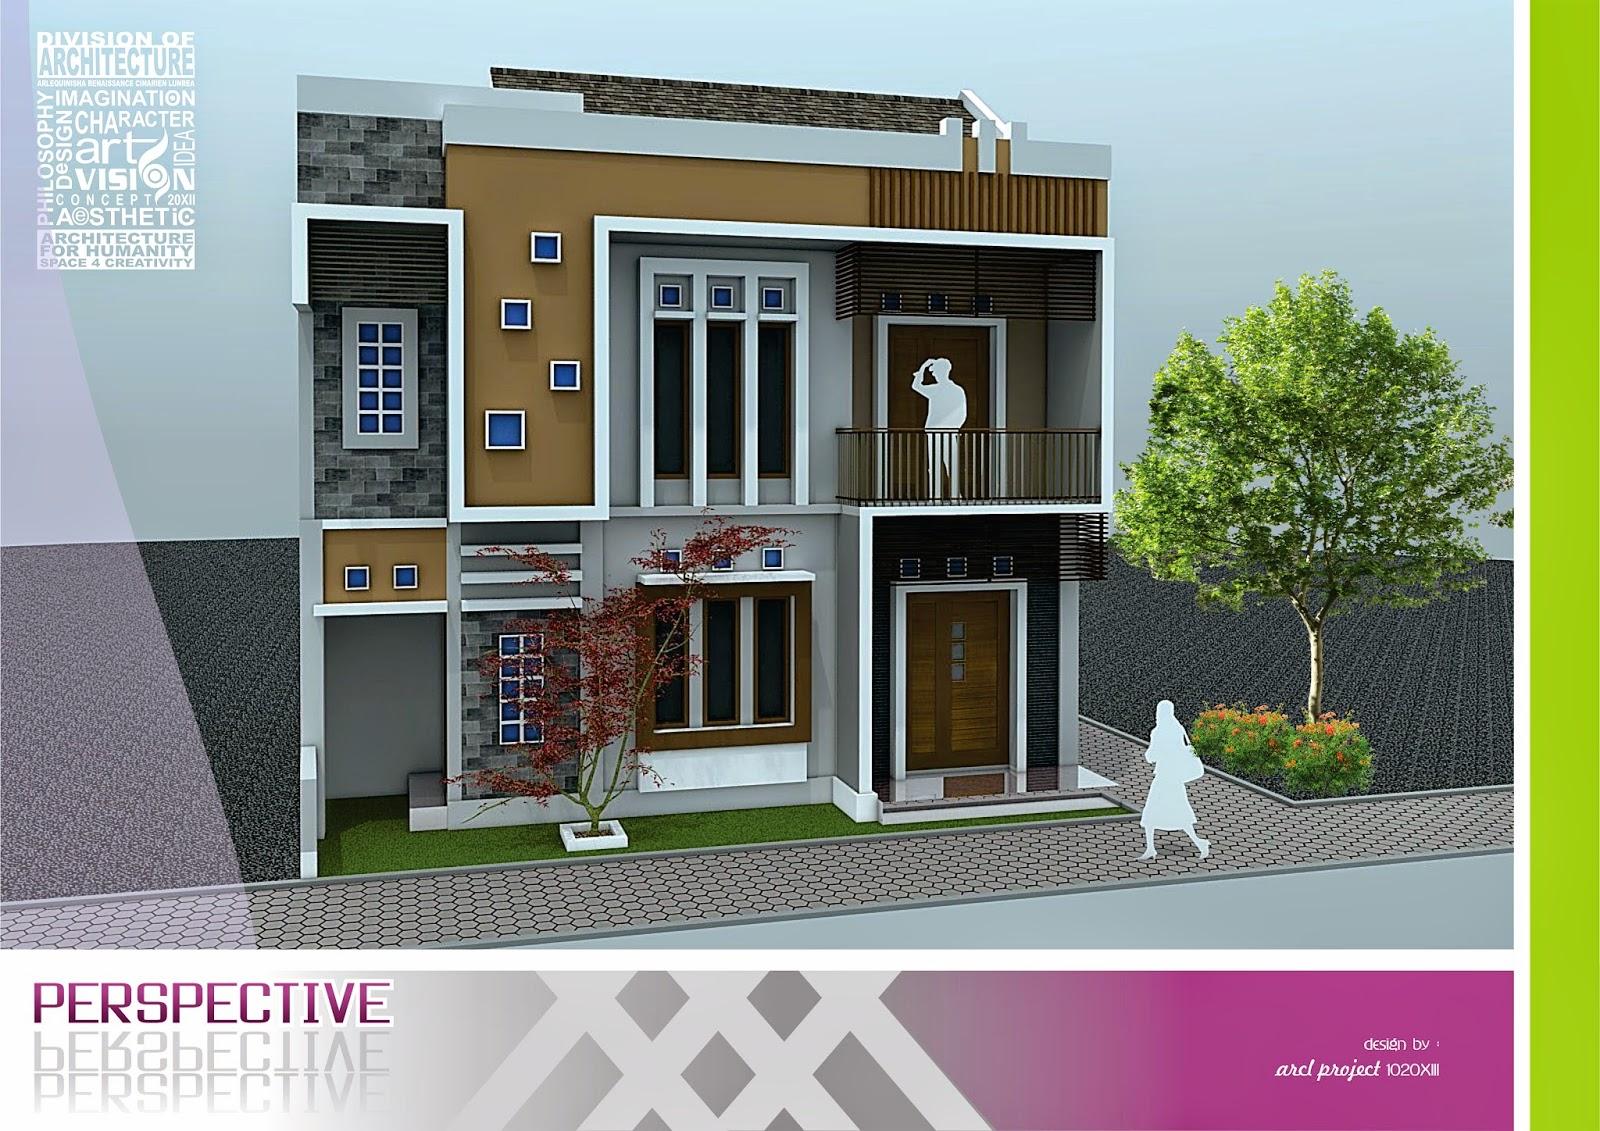 Desain Rumah Minimalis, aries pribadie , arlequin architects , desain rumah tinggal minimalis, universitas widya mataram yogyakarta